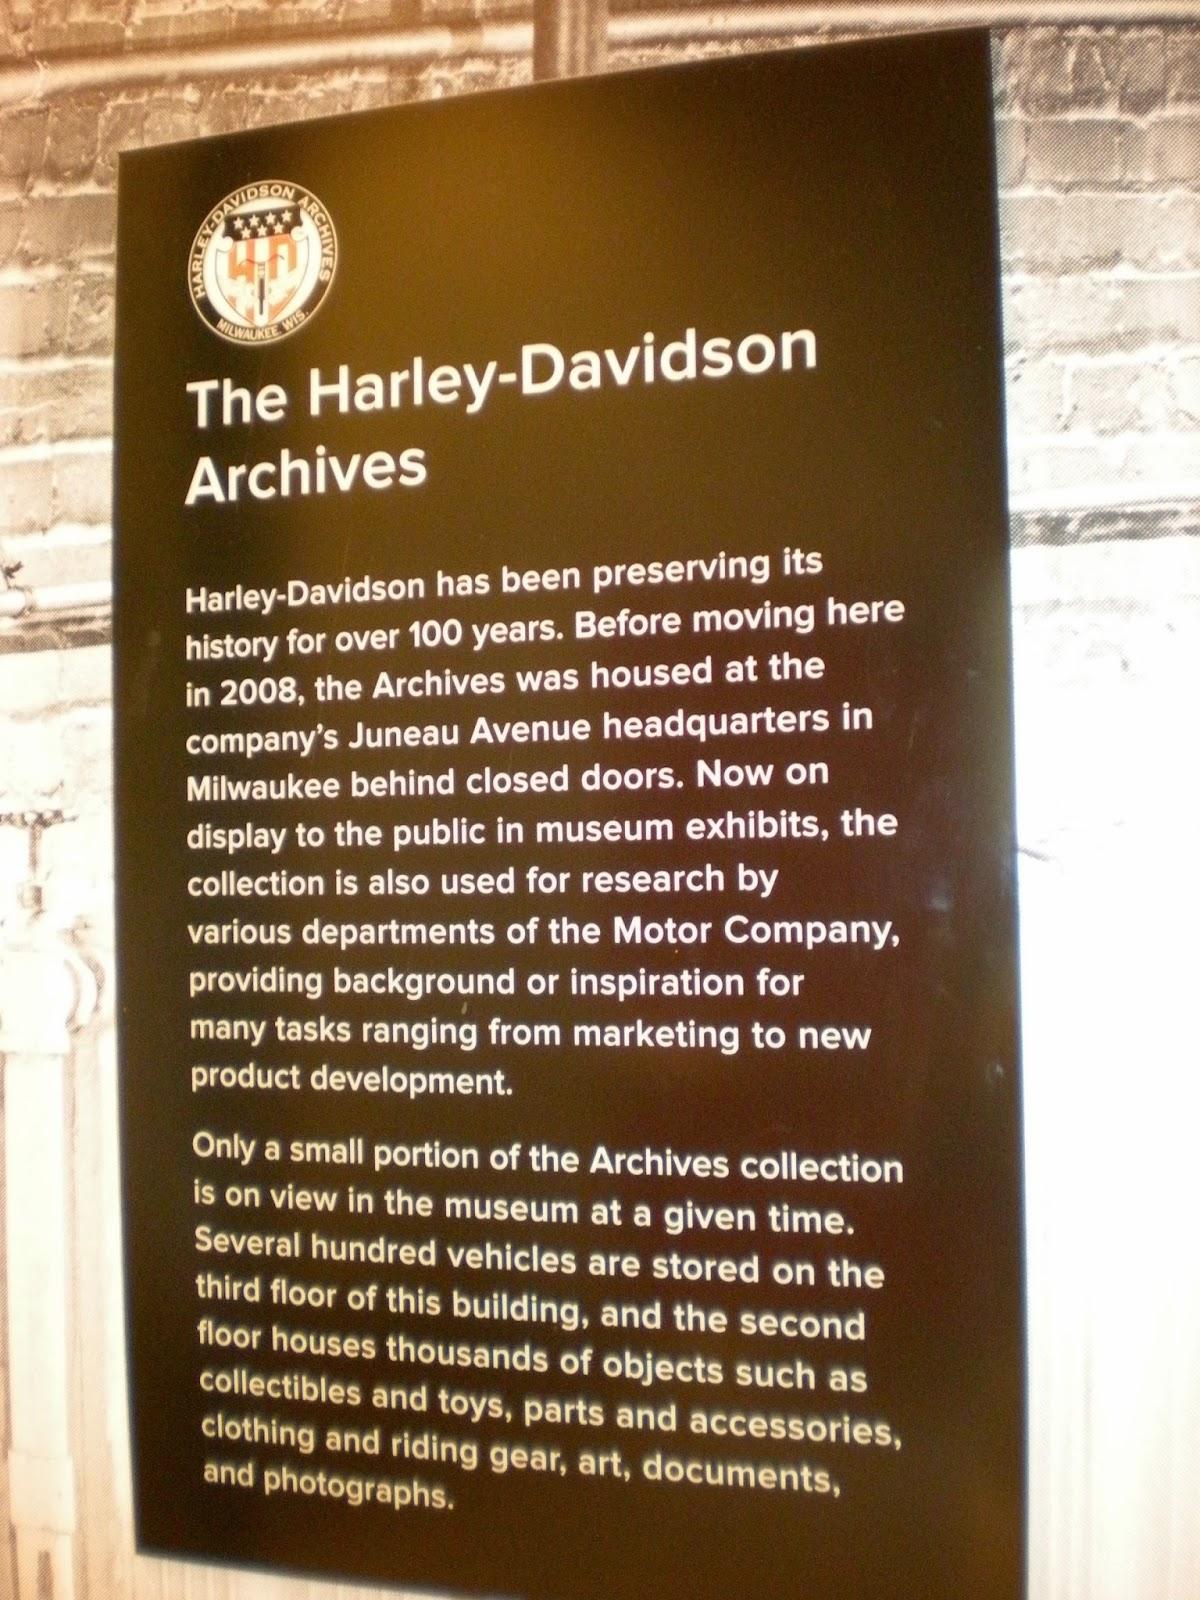 Cruisin' Museums with Jonette Slabey: Harley-Davidson Museum